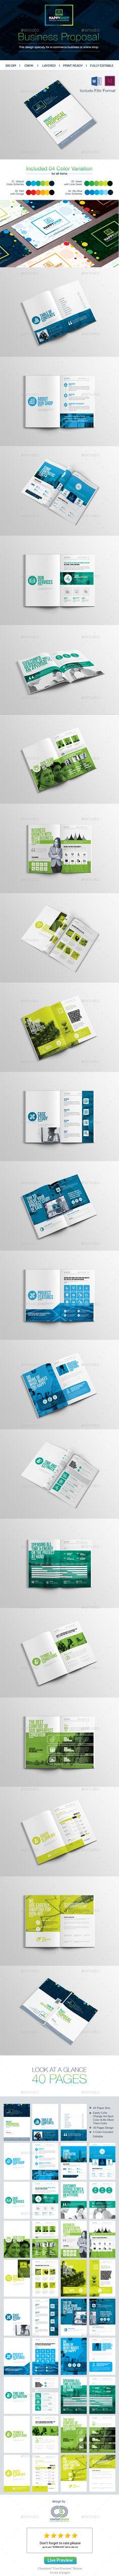 Proposal Template Vector EPS, InDesign INDD, AI Illustrator #design Download: http://graphicriver.net/item/proposal/14488550?ref=ksioks